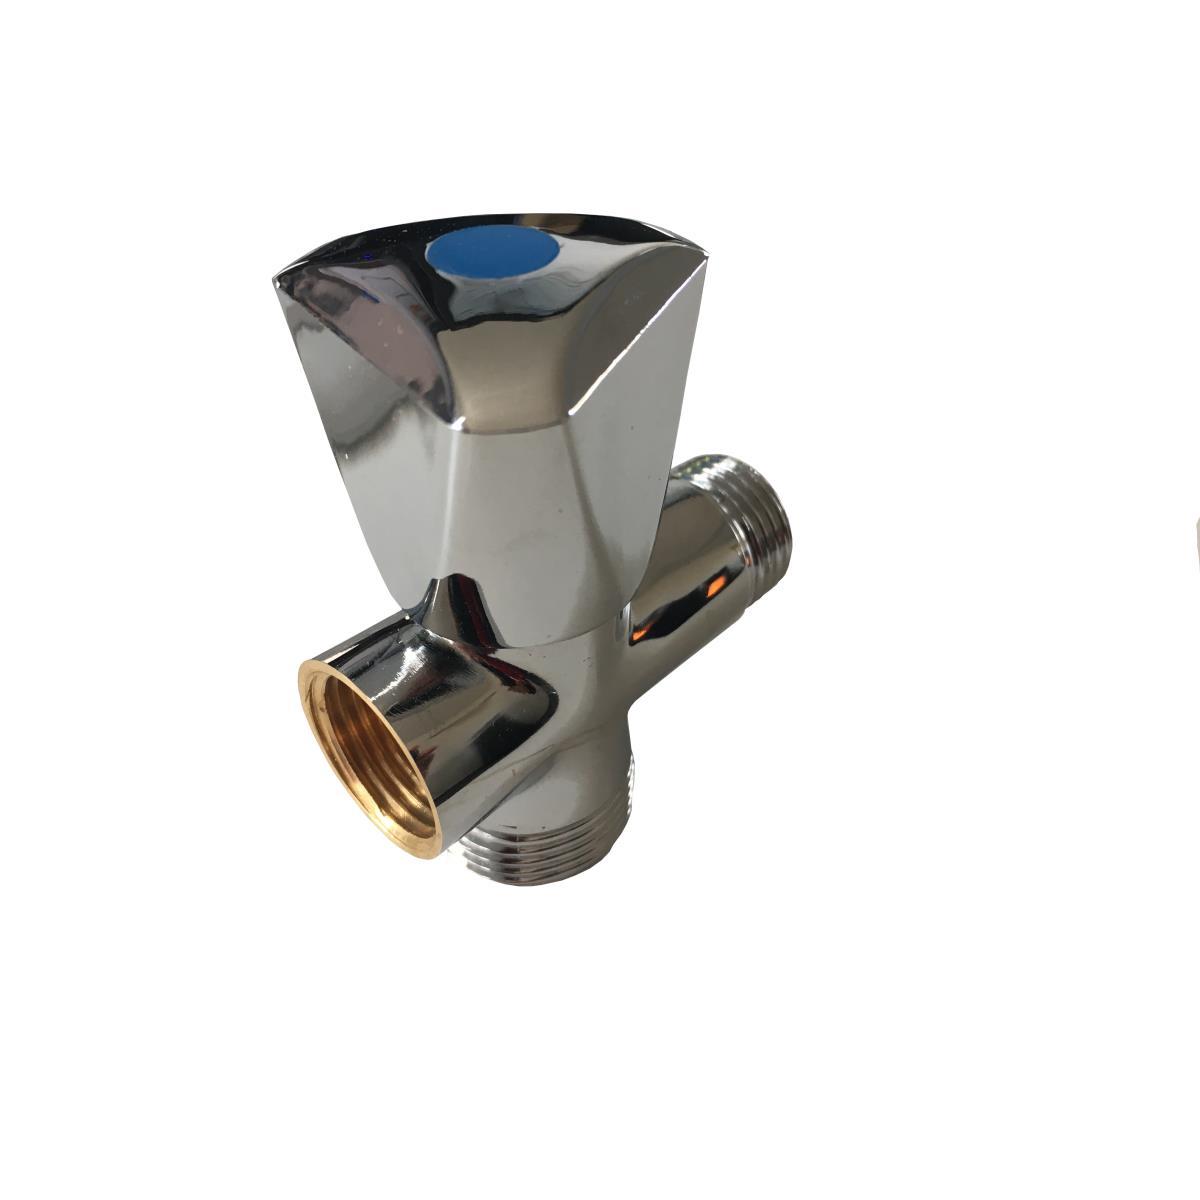 Geschirrspüler Geschirrspülmaschine Waschmaschine Wassermagnetventil AC 220V